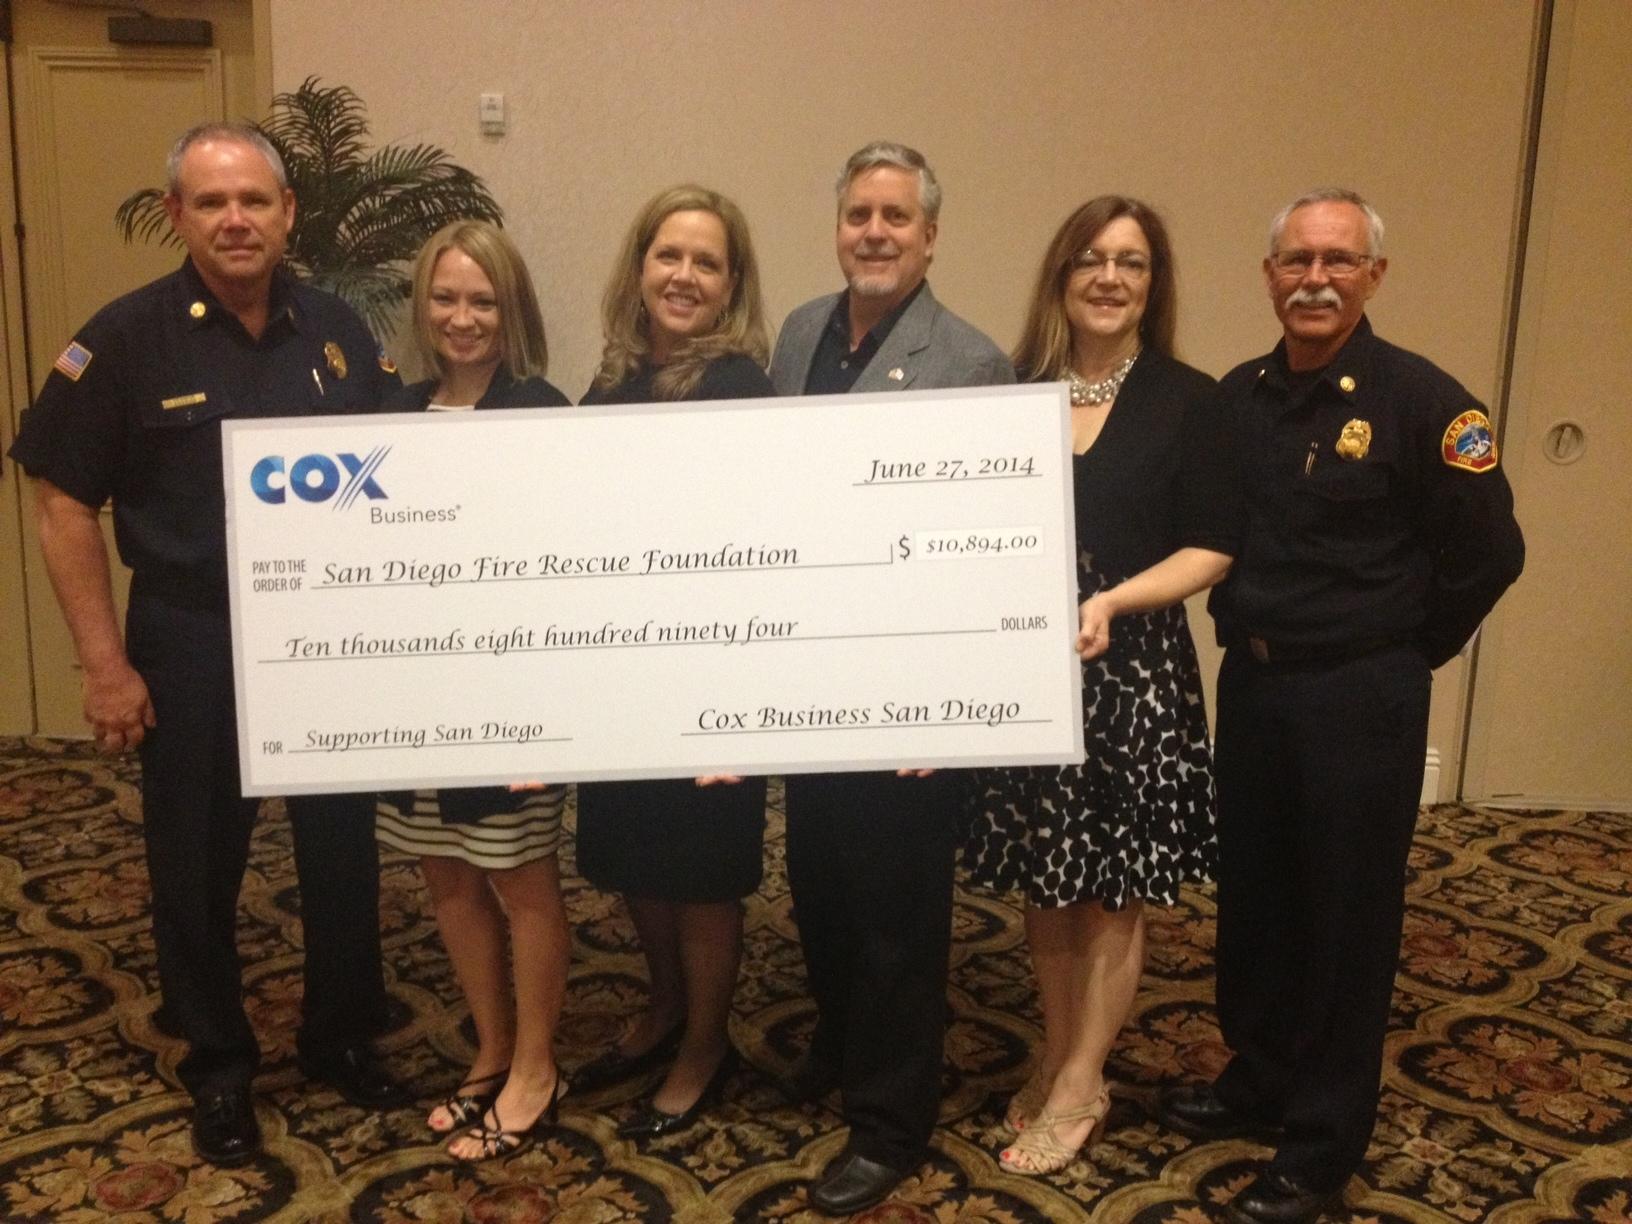 Top Tech Exec Awards Donates Nearly $11,000 to Support San